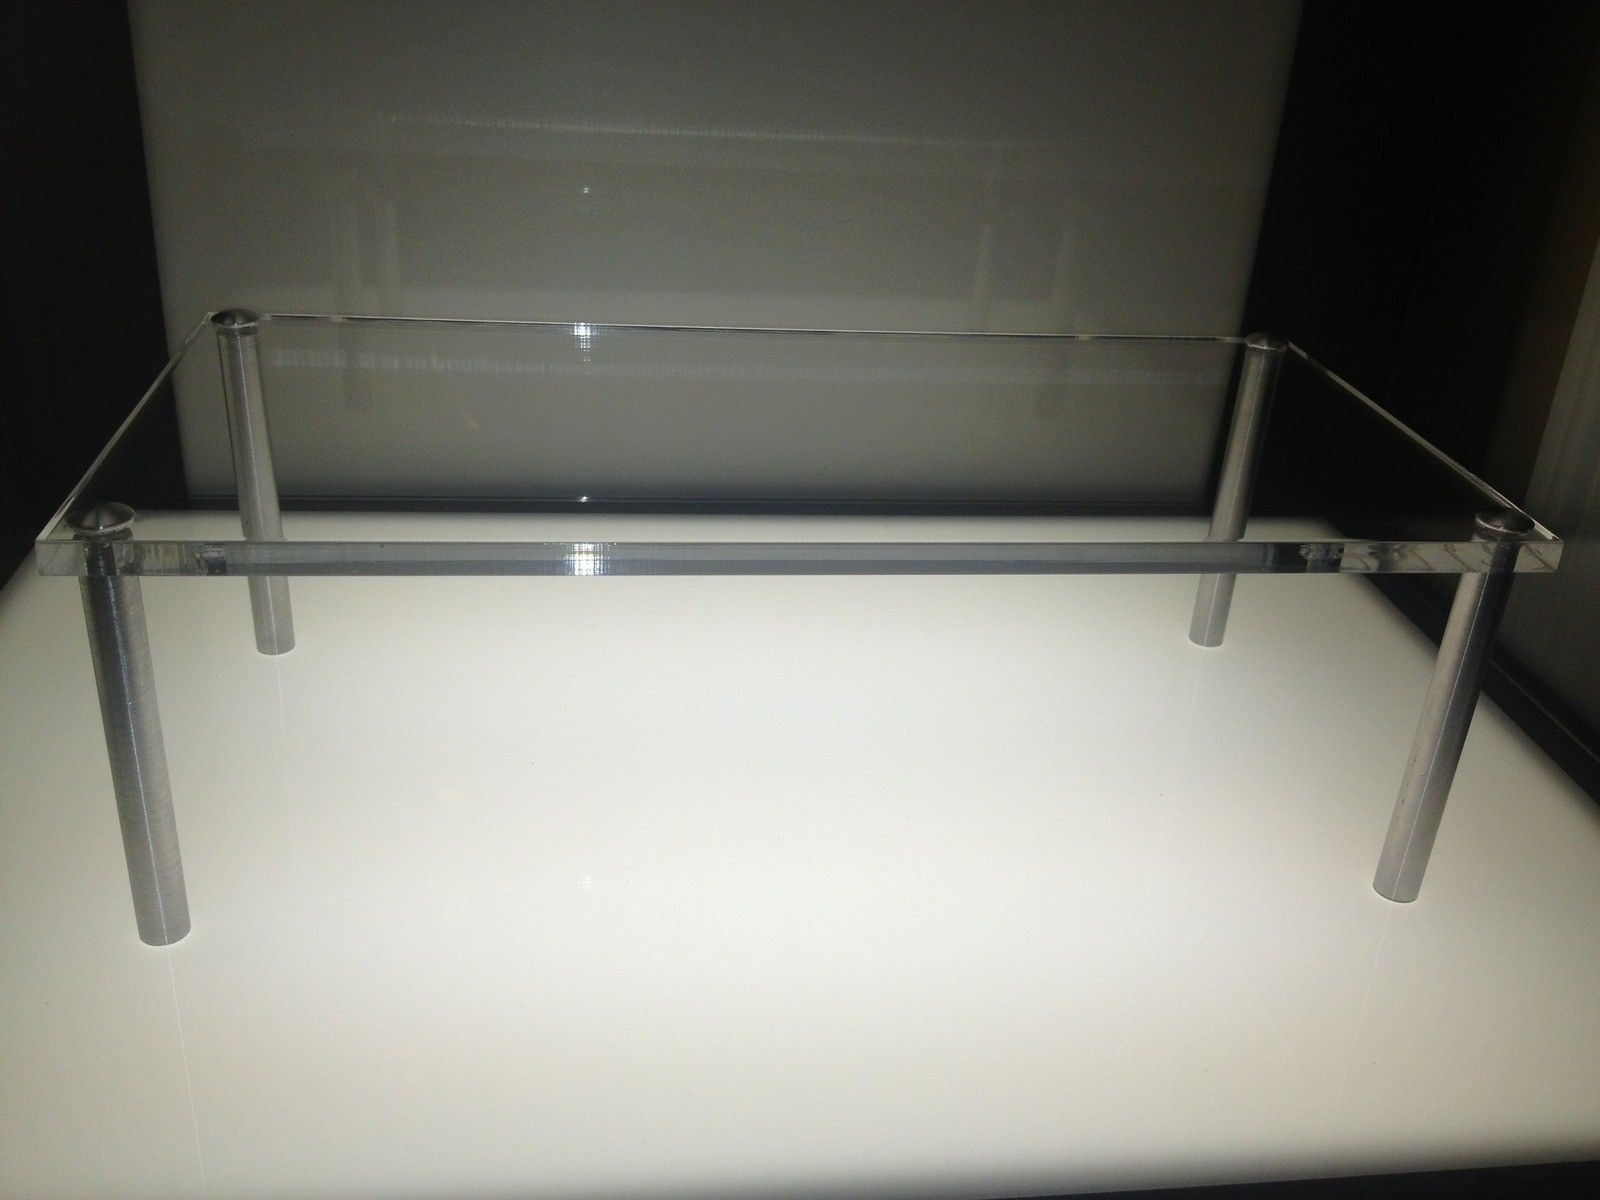 Brand New Oakley Acrylic Display Shelf $45.00 Shipped To USA - oakleyshelf01.jpg